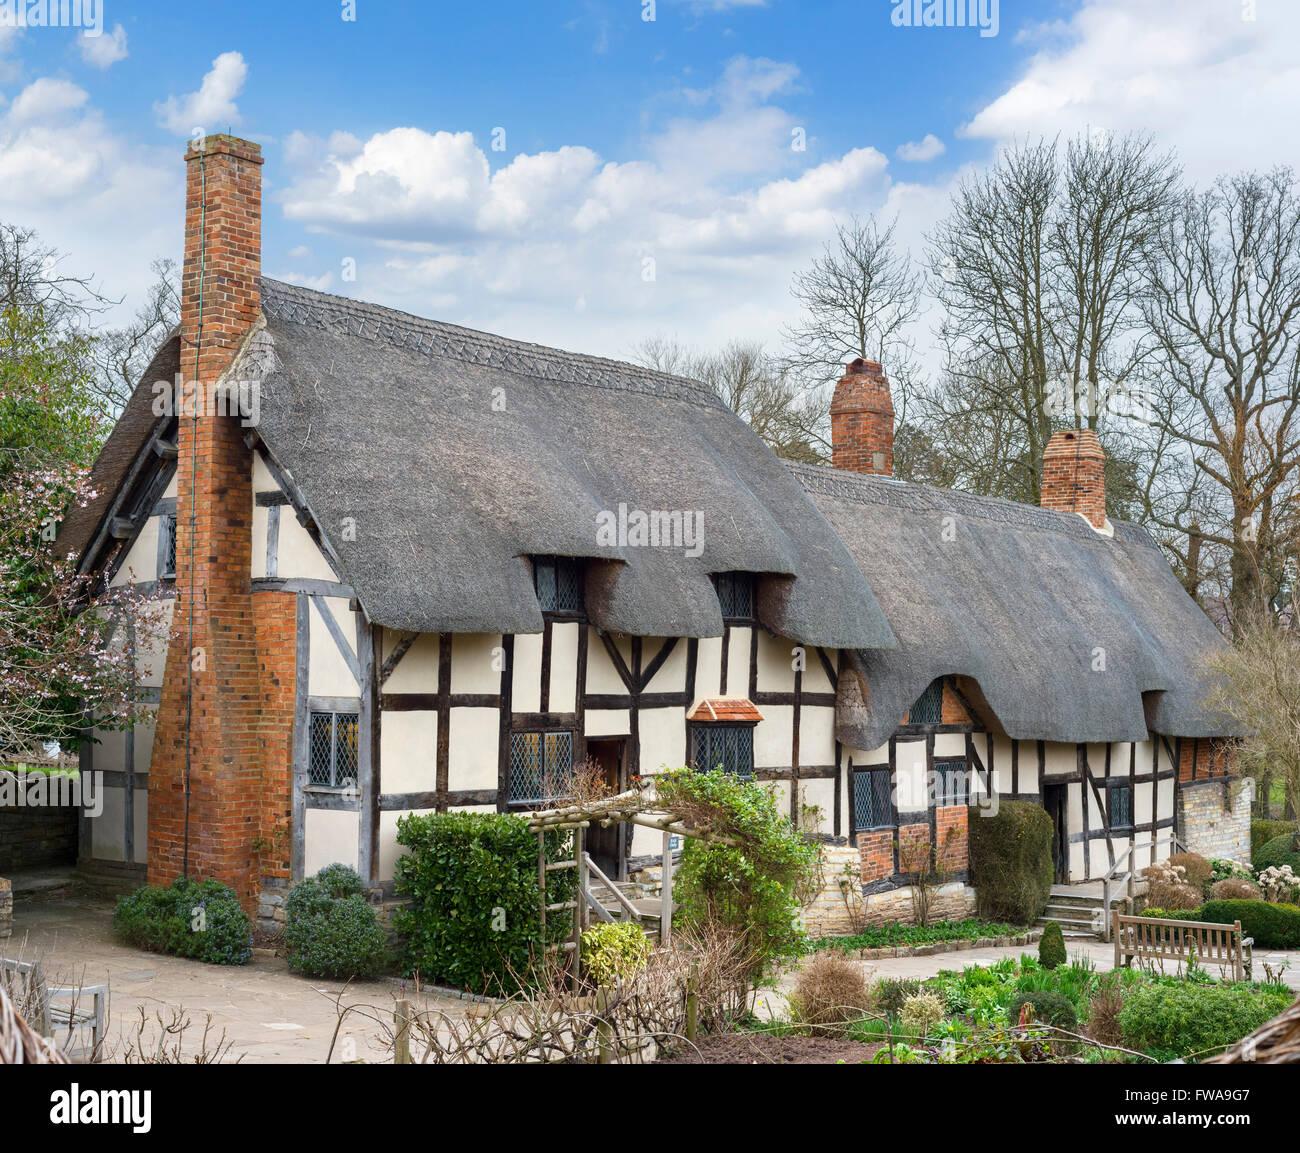 Anne Hathaway's Cottage, Shottery, Stratford-upon-Avon, Warwickshire, England, UK - Stock Image